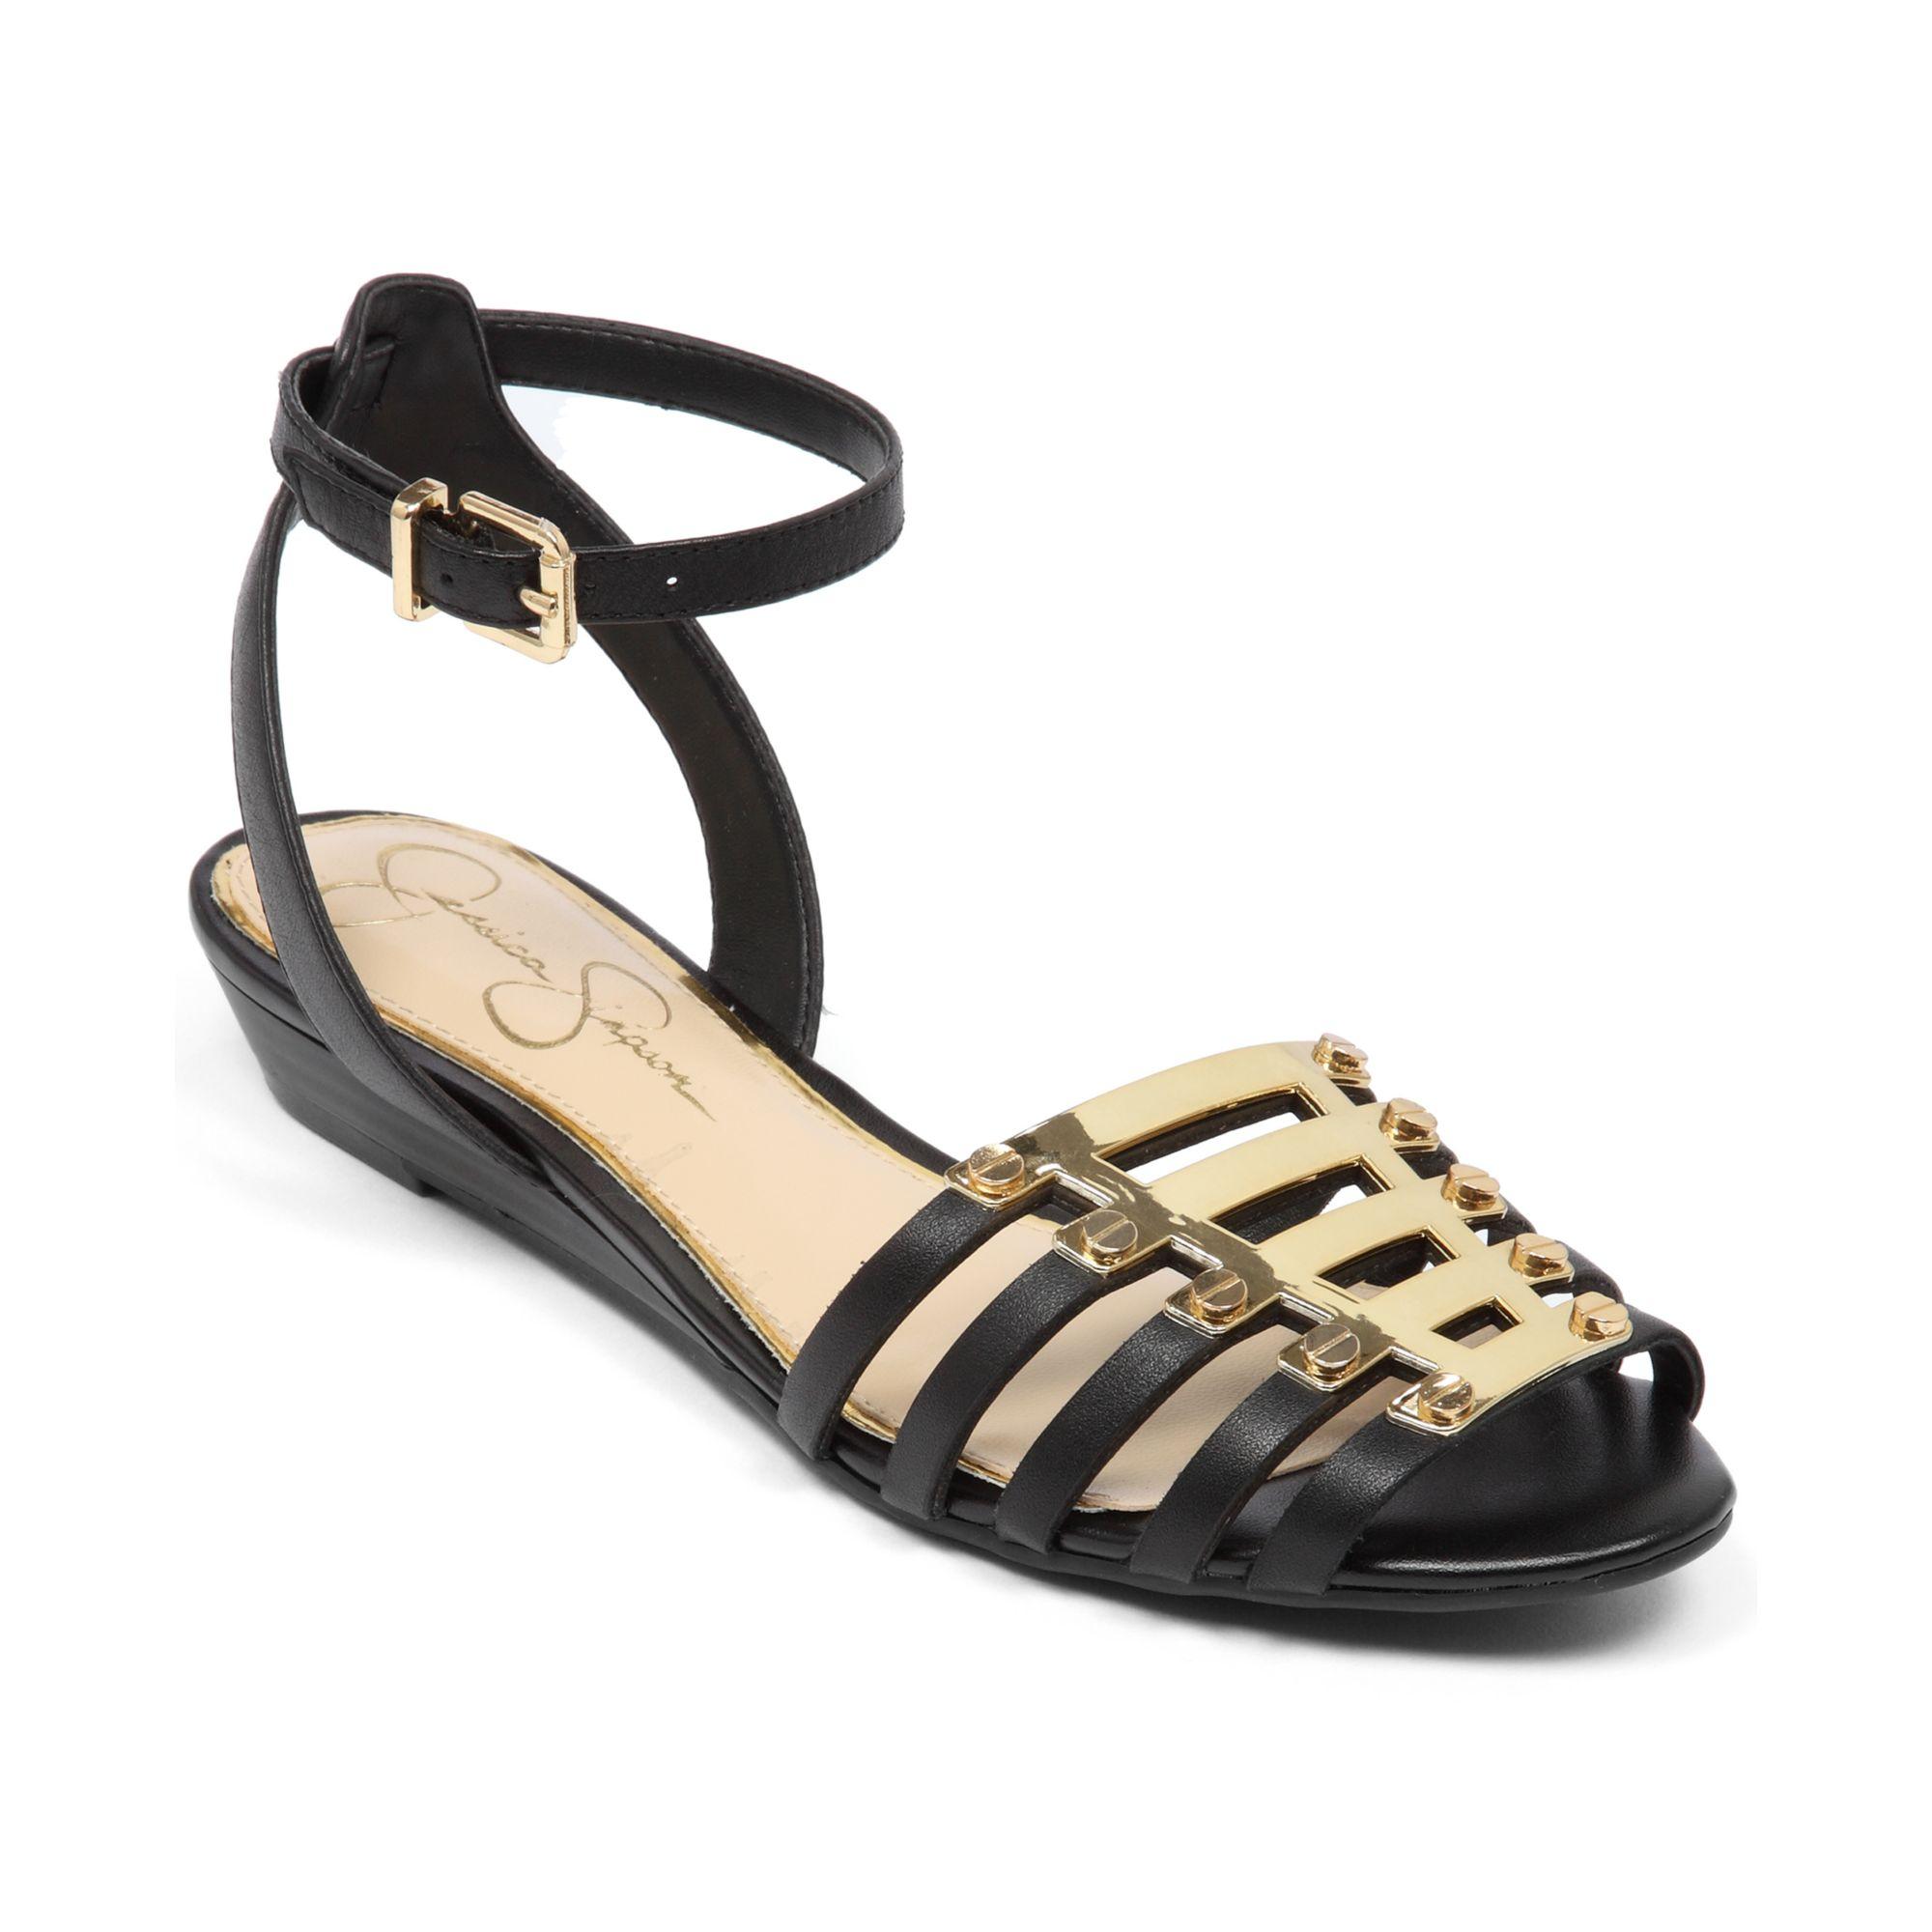 Jessica Simpson Shoes Black Flats